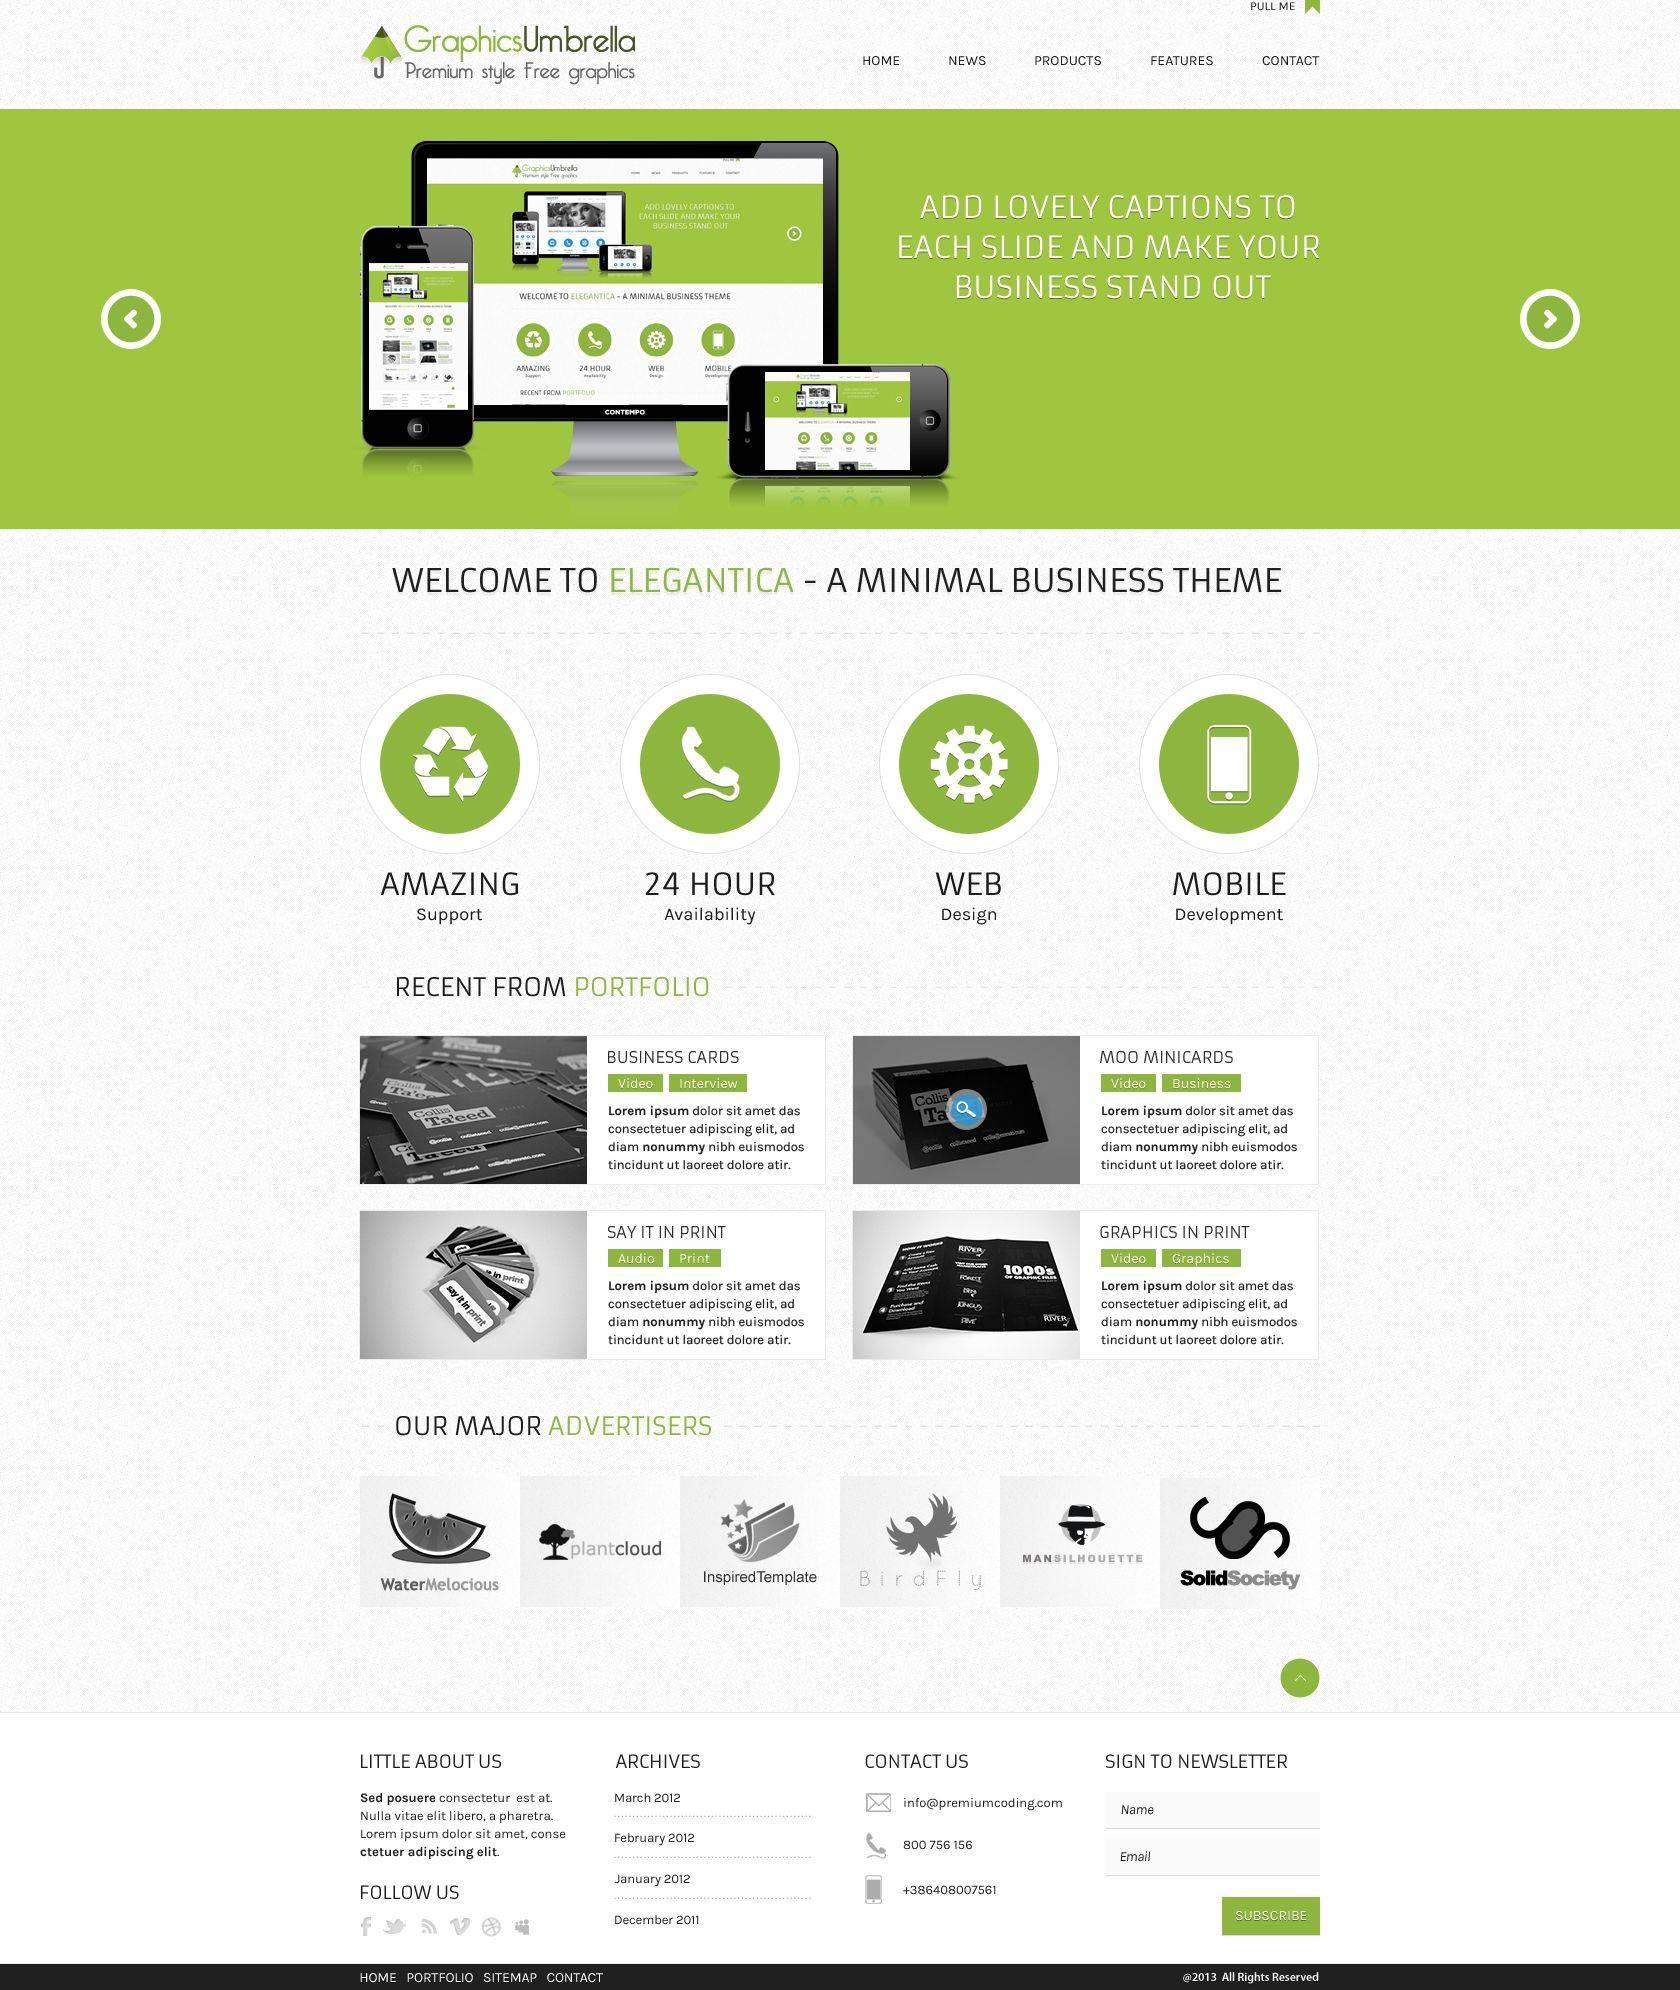 Premium Ecommerce Templates Free Download